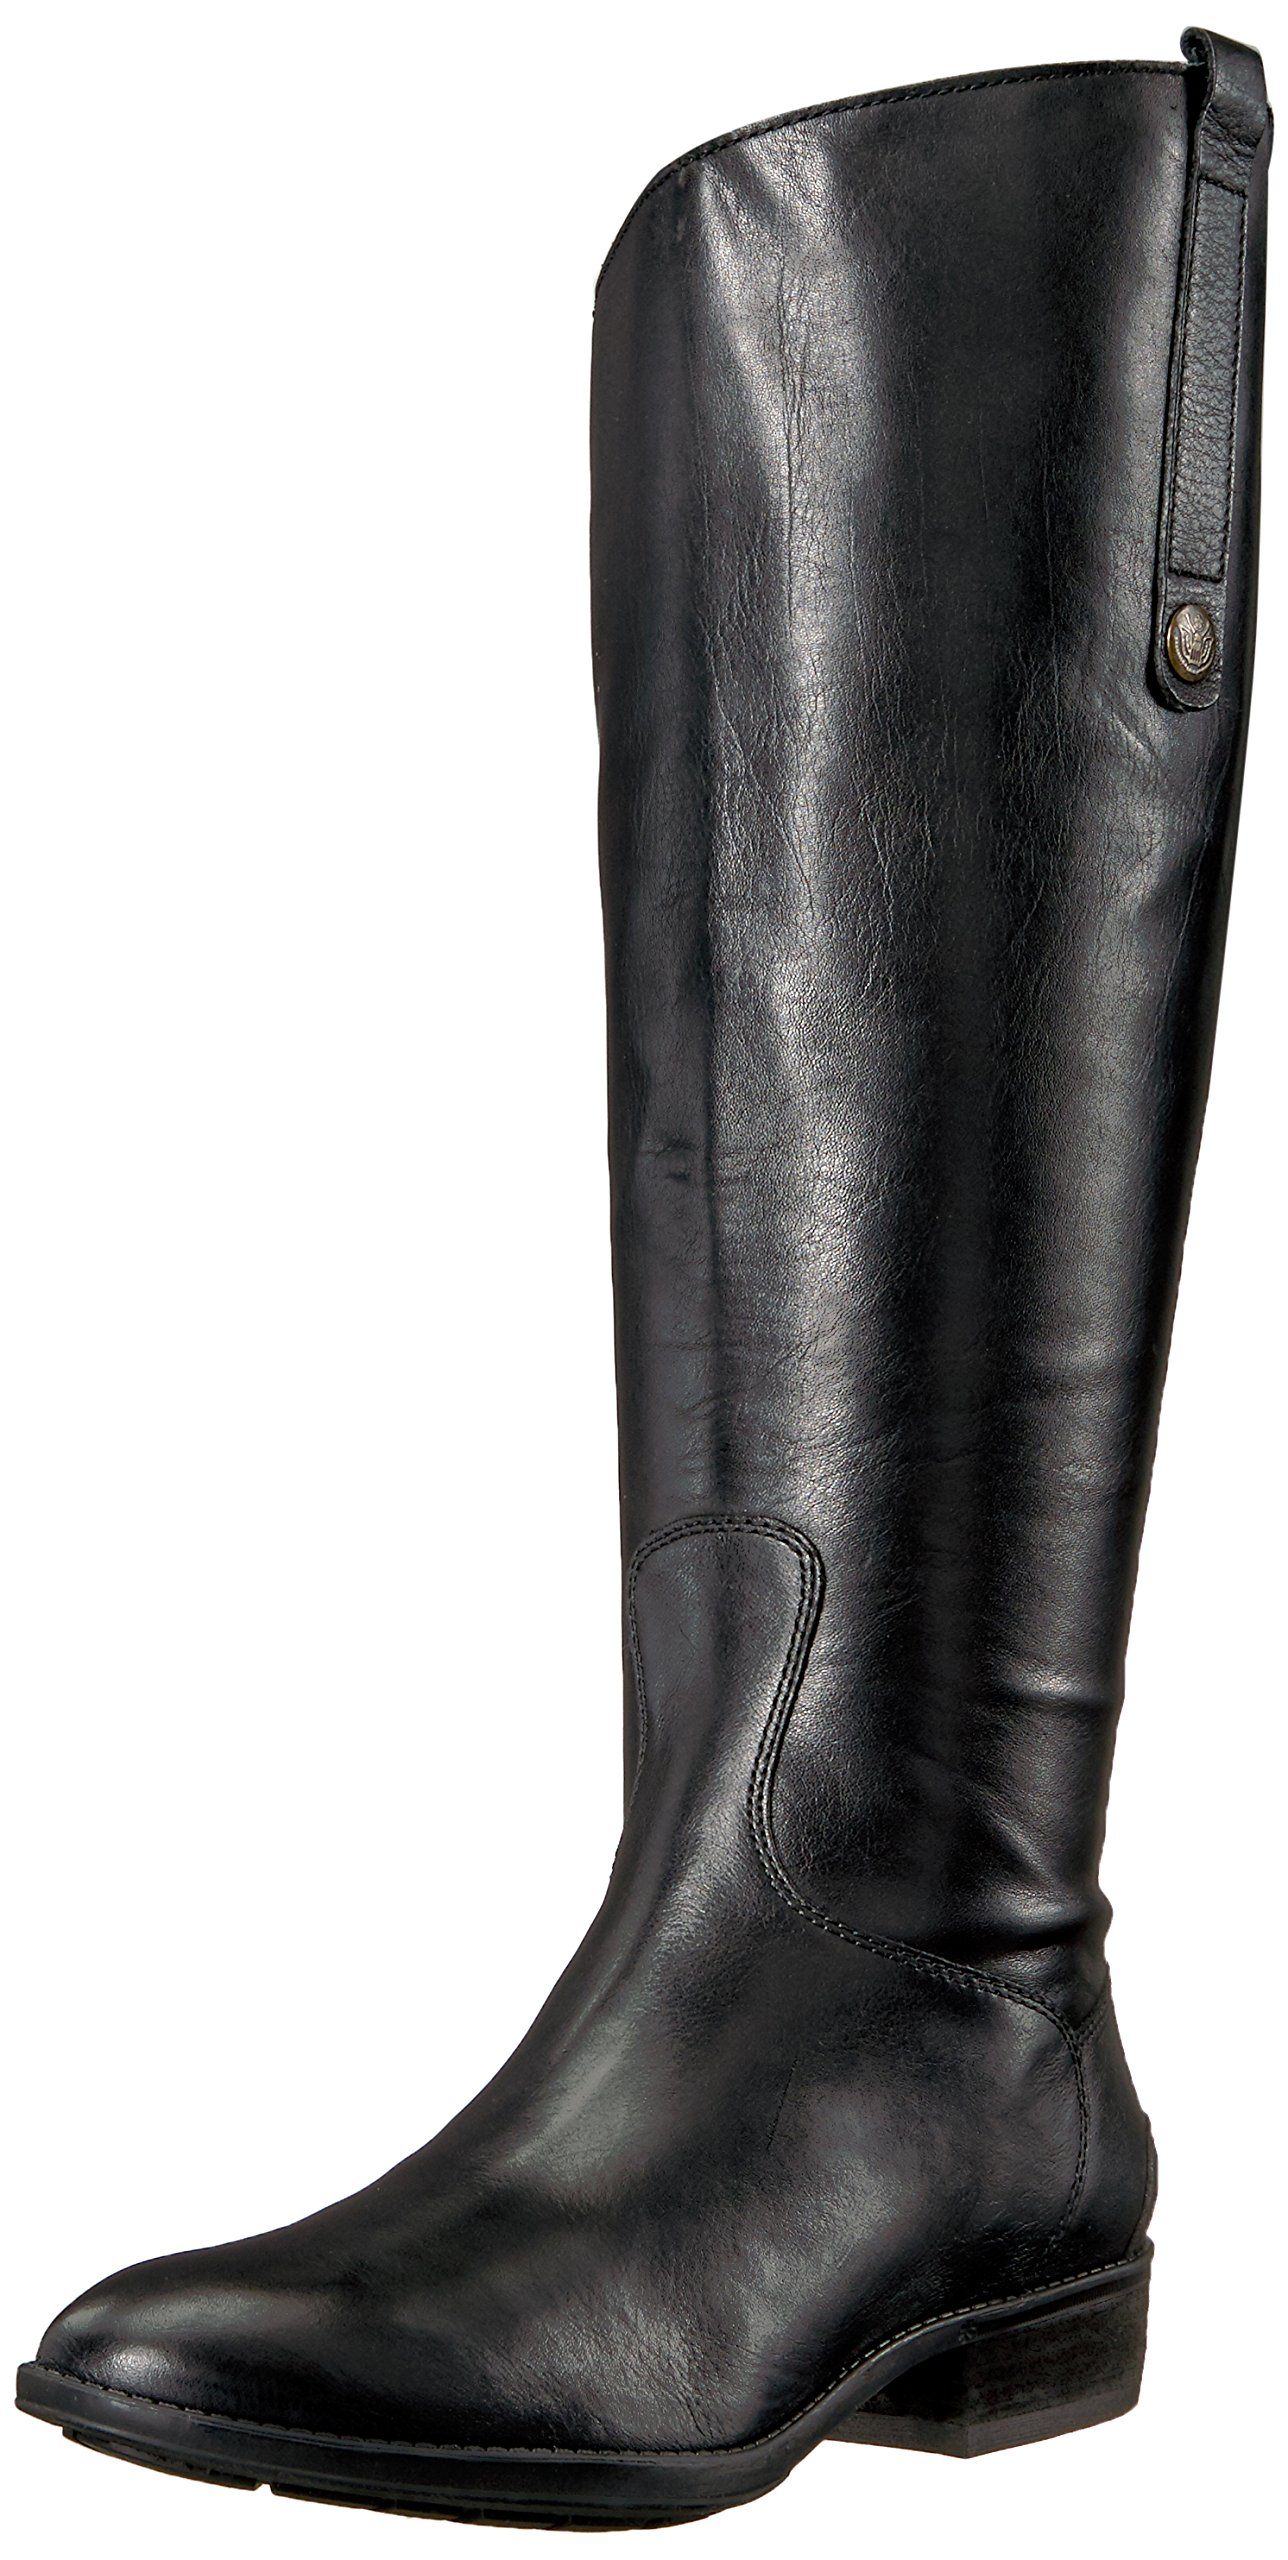 Sam Edelman Women's Penny 2 Equestrian Boot, Black Leather, 8.5 Wide US by Sam Edelman